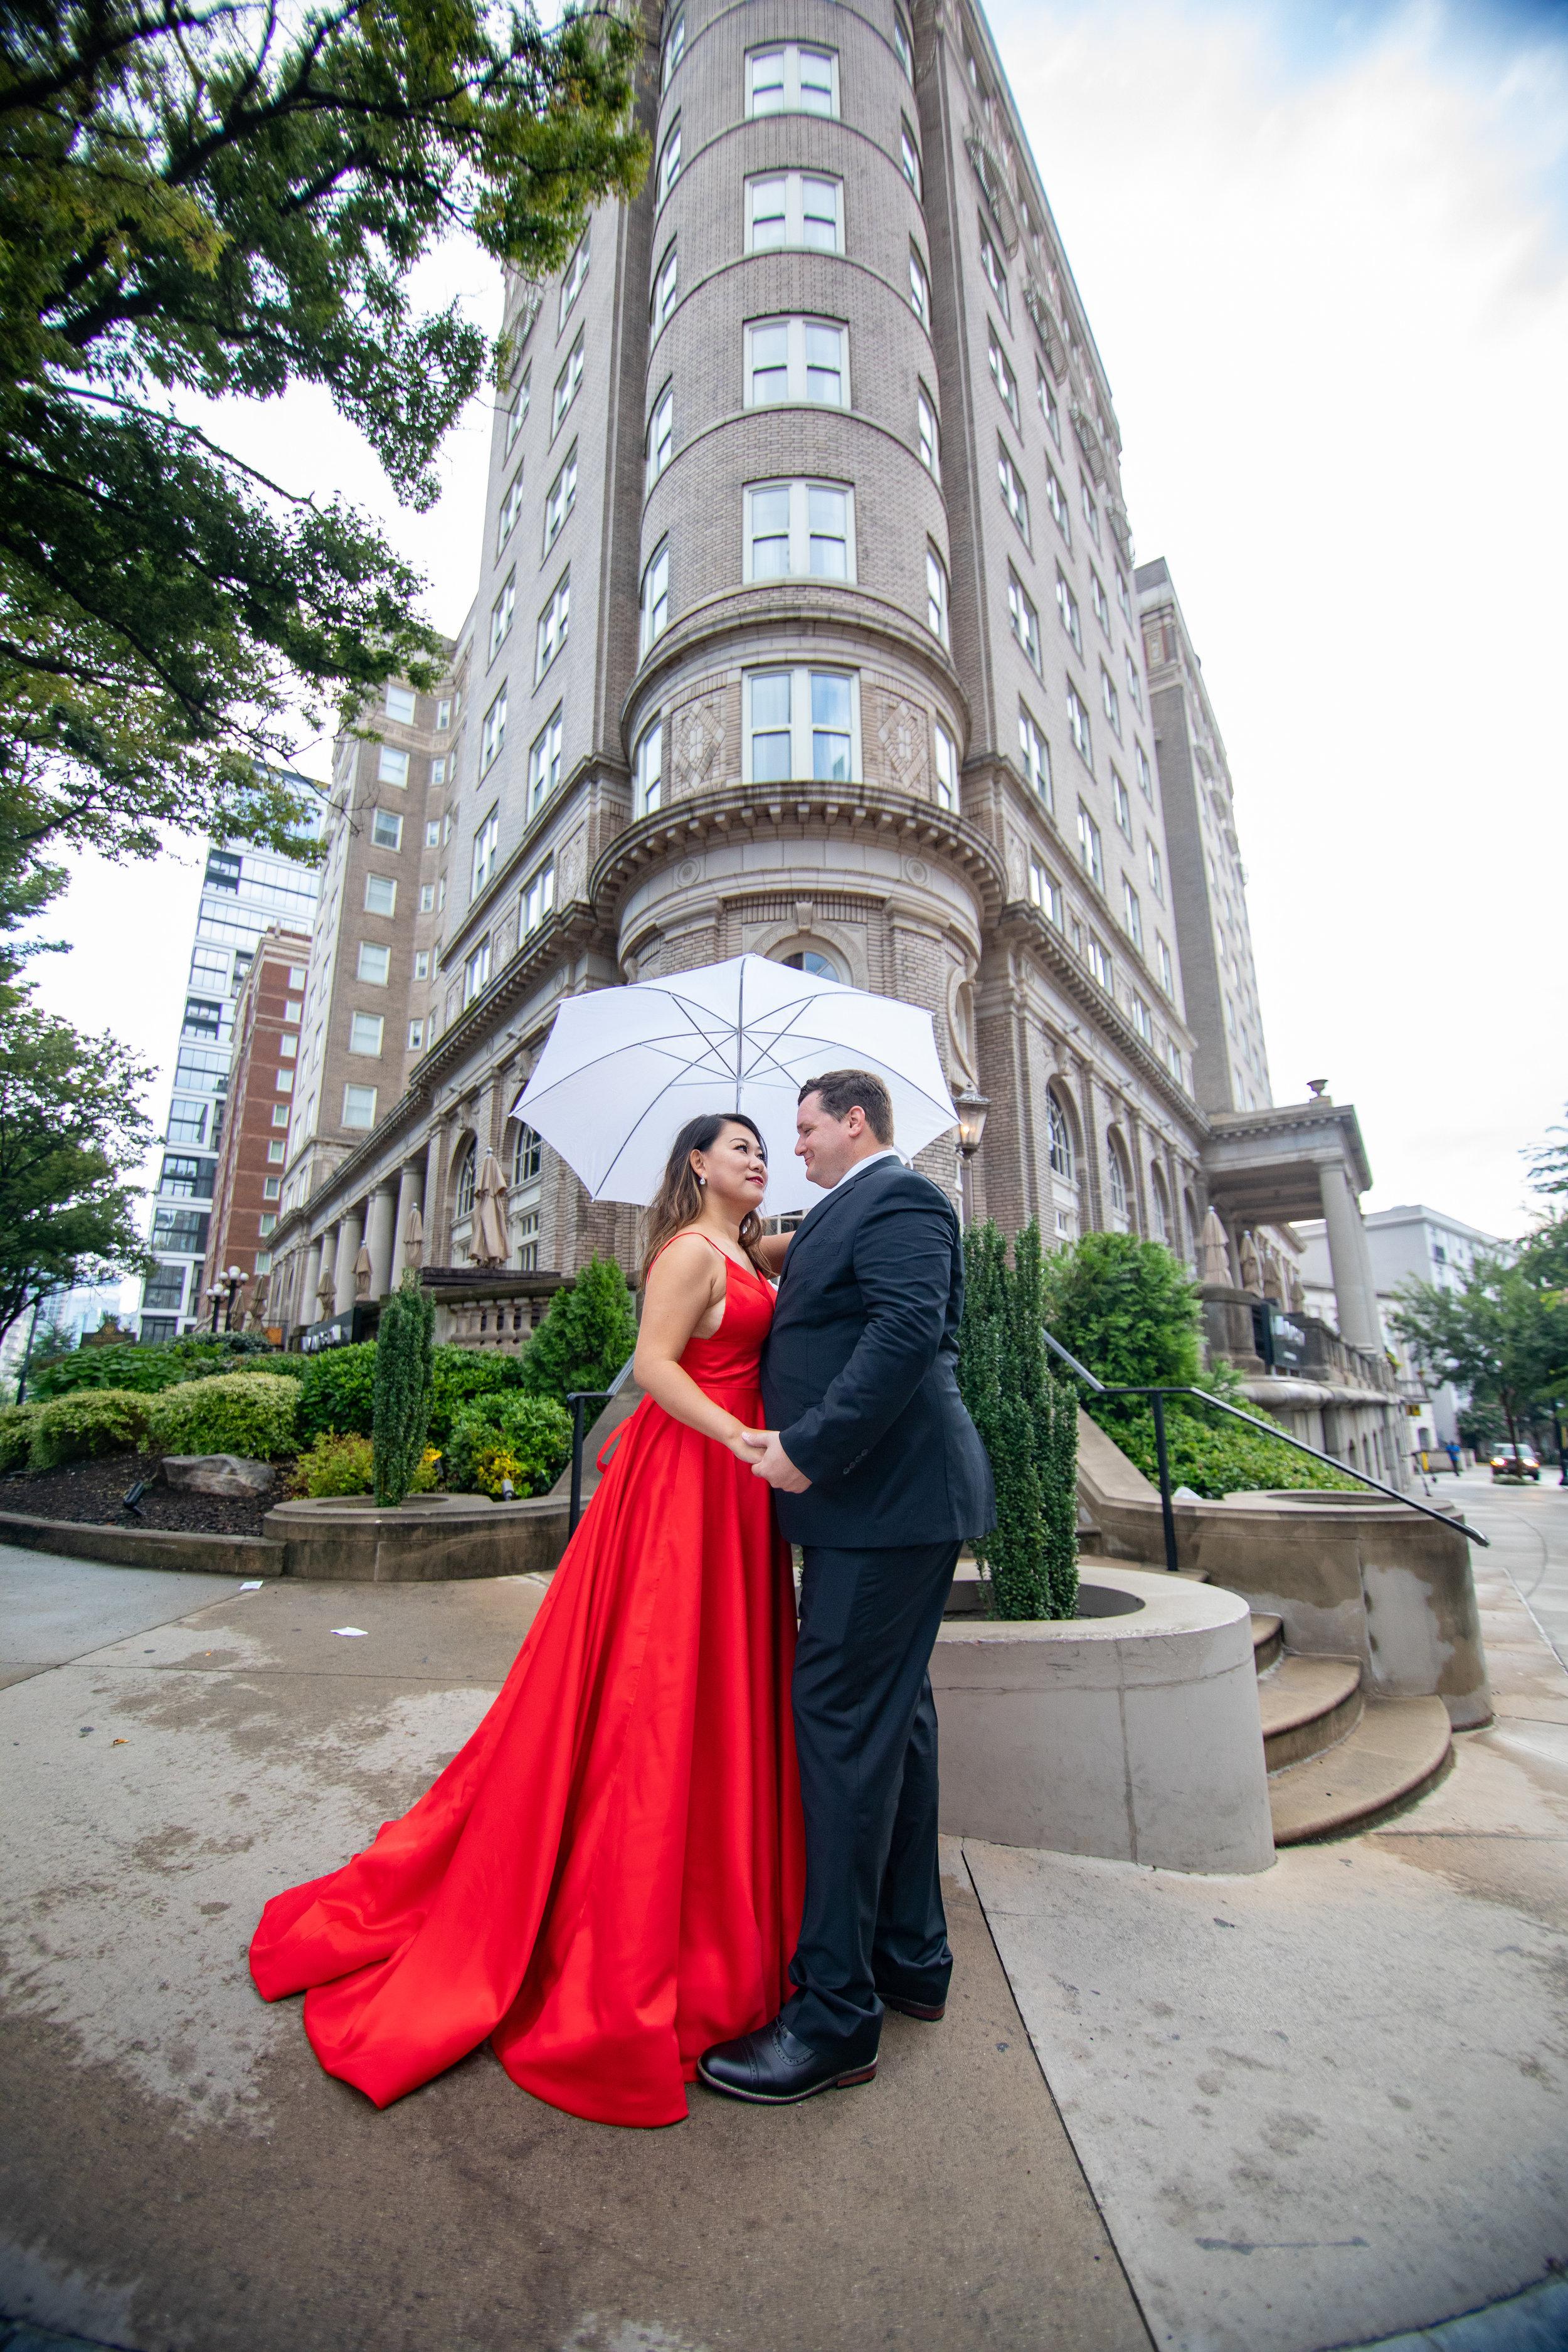 The Historic and elegant Georgian Terrace located at the corner of Ponce de Leon and Peachtree Street captured by the Atlanta wedding photographers at ww.AtlantaAritsicWeddings.com